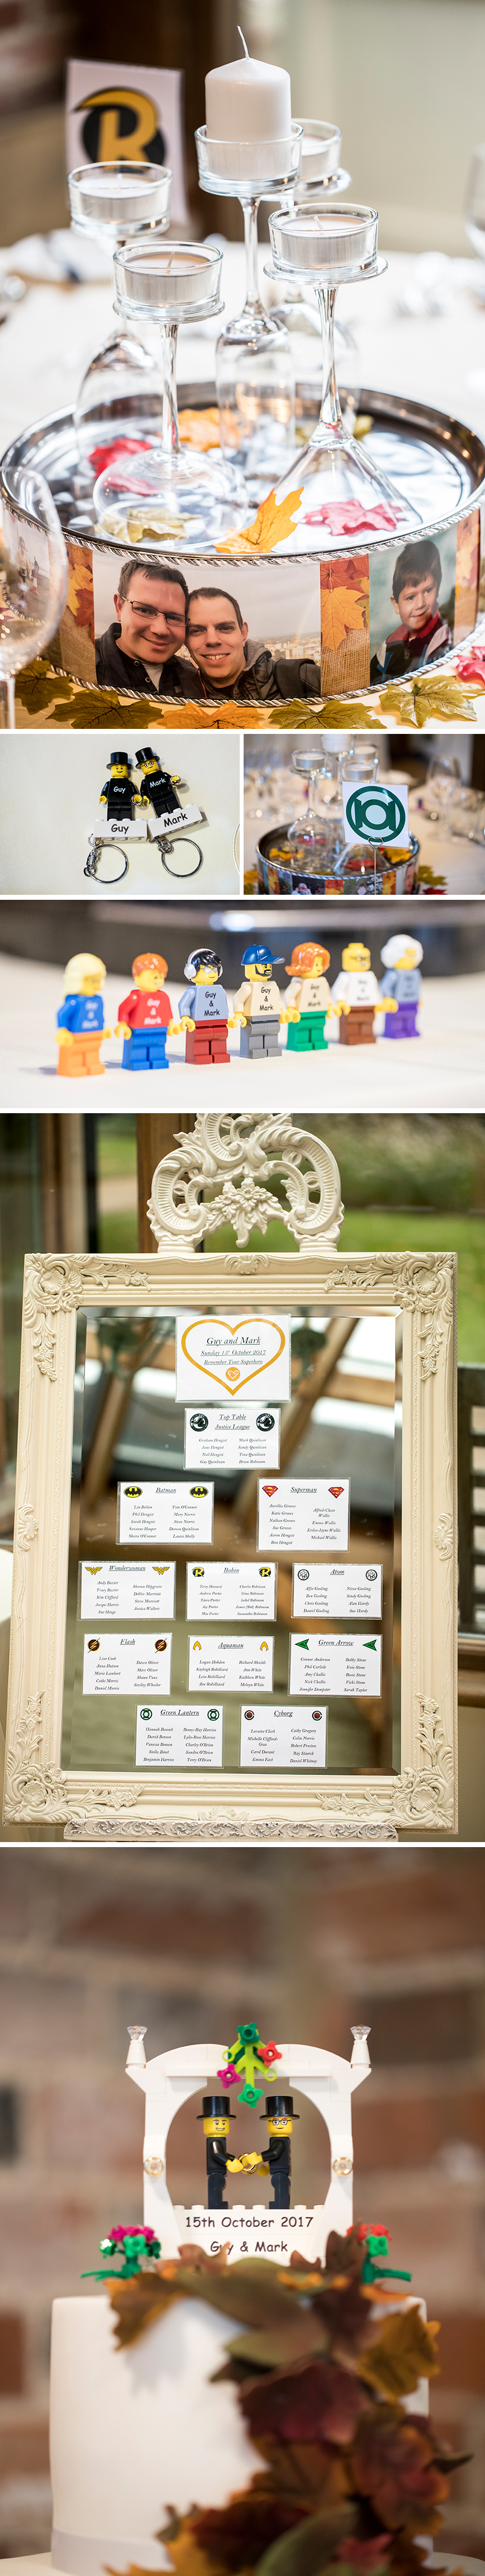 Real Wedding - Guy and Mark's Idyllic Autumn Wedding at Gaynes Park | CHWV